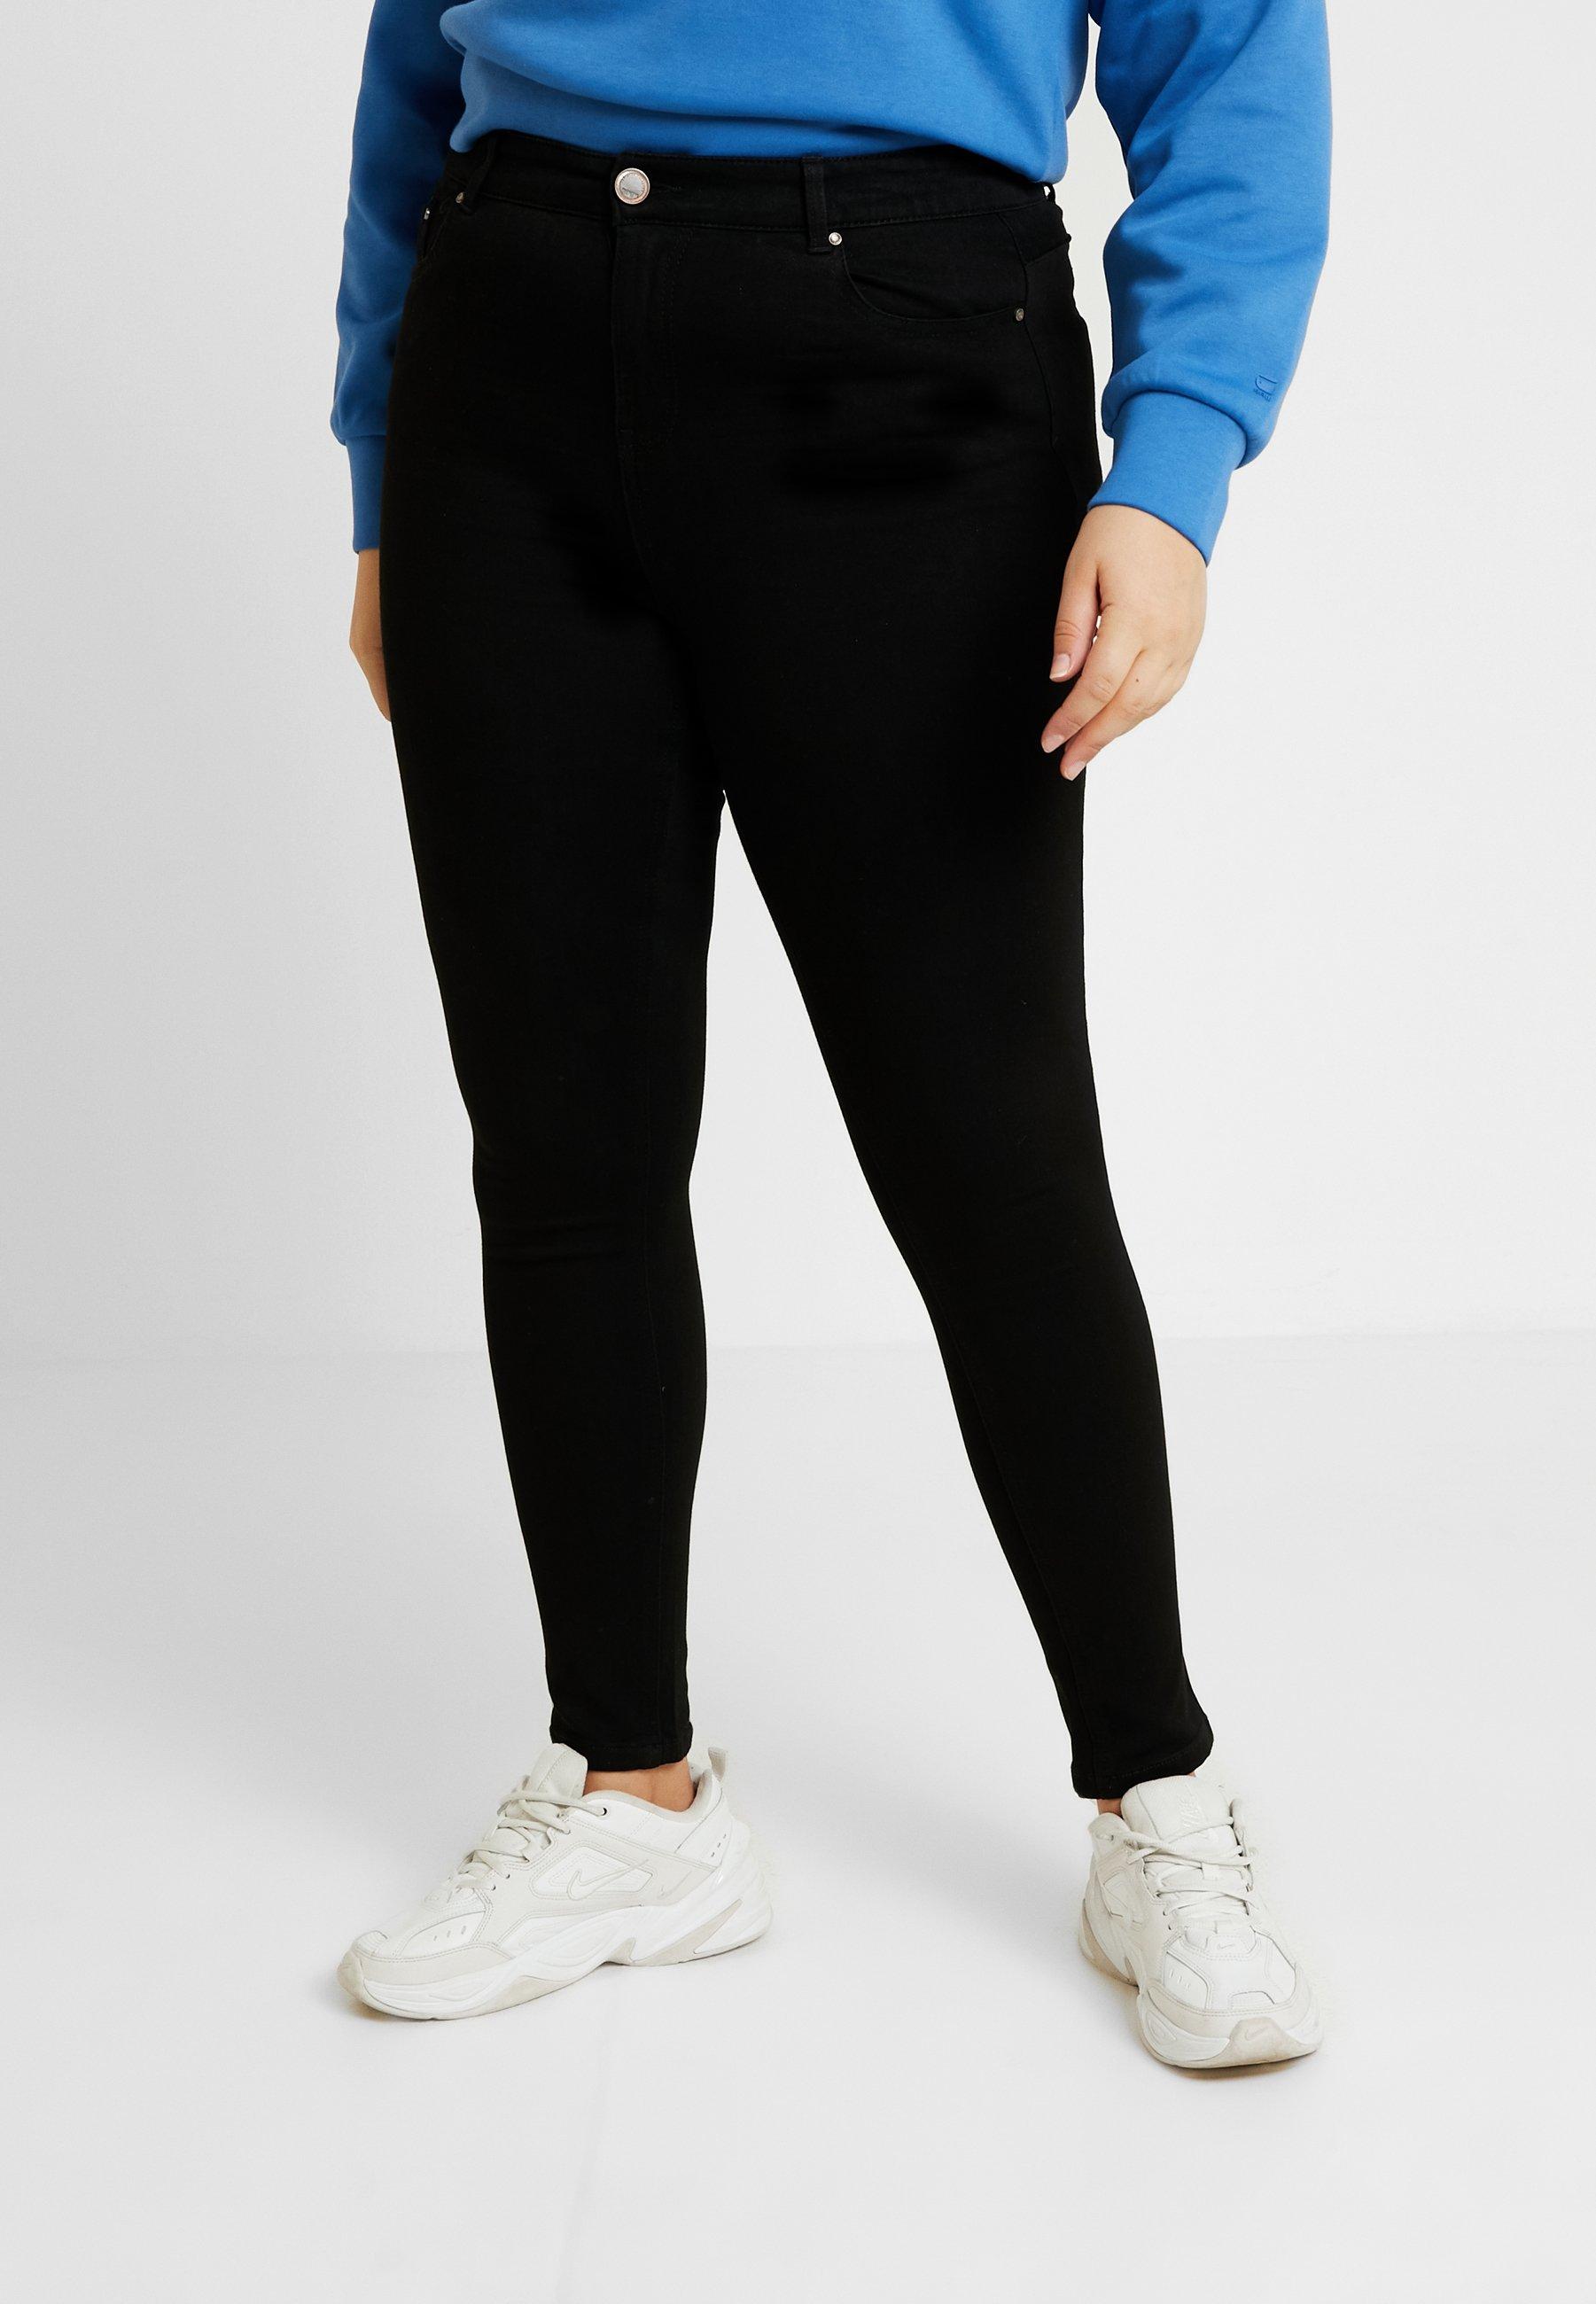 Capsule Simply Be WayJeans Infinity By Skinny Black iPkuXTOZ